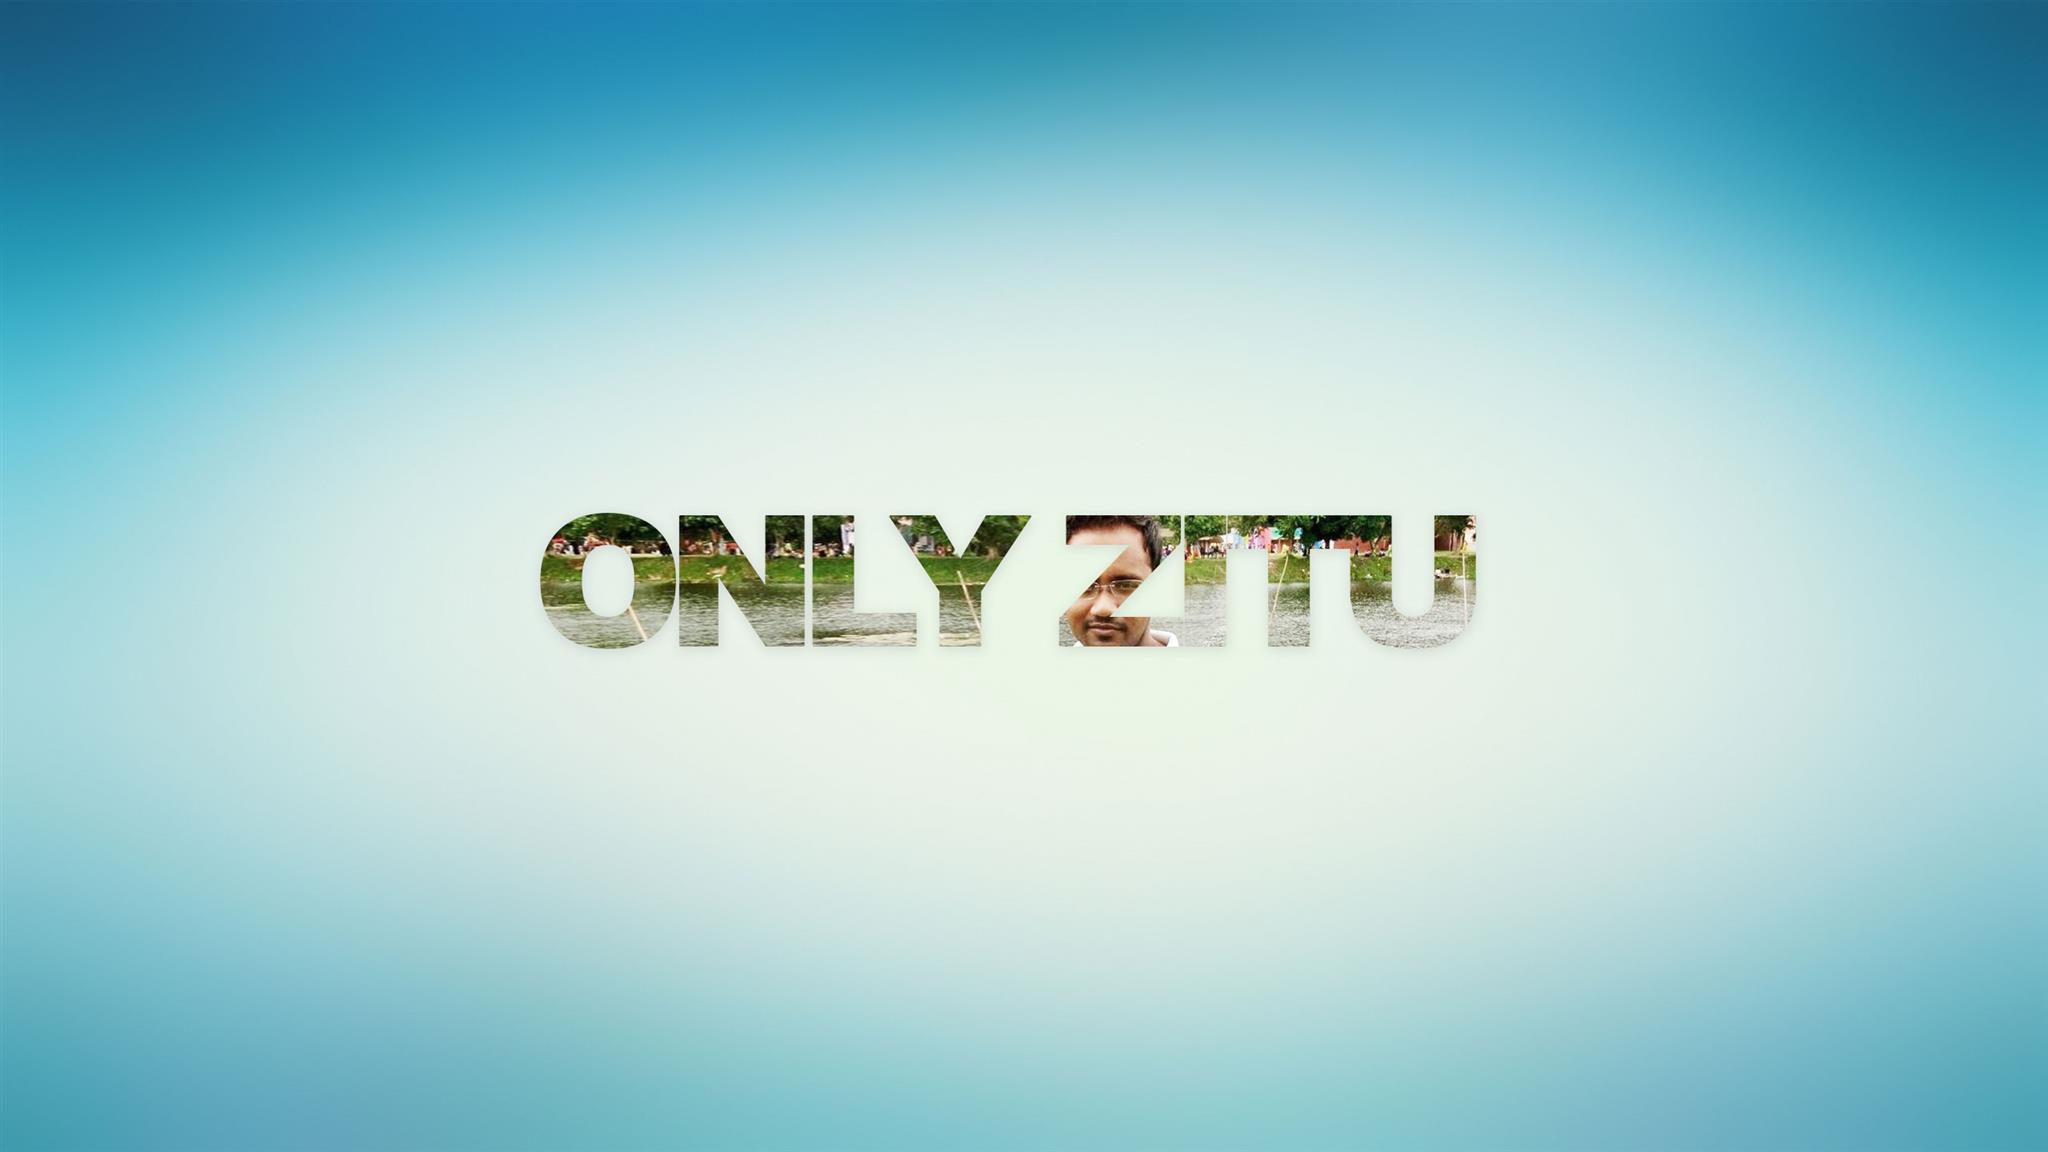 How I Became an Entrepreneur: OnlyZitu's Startup